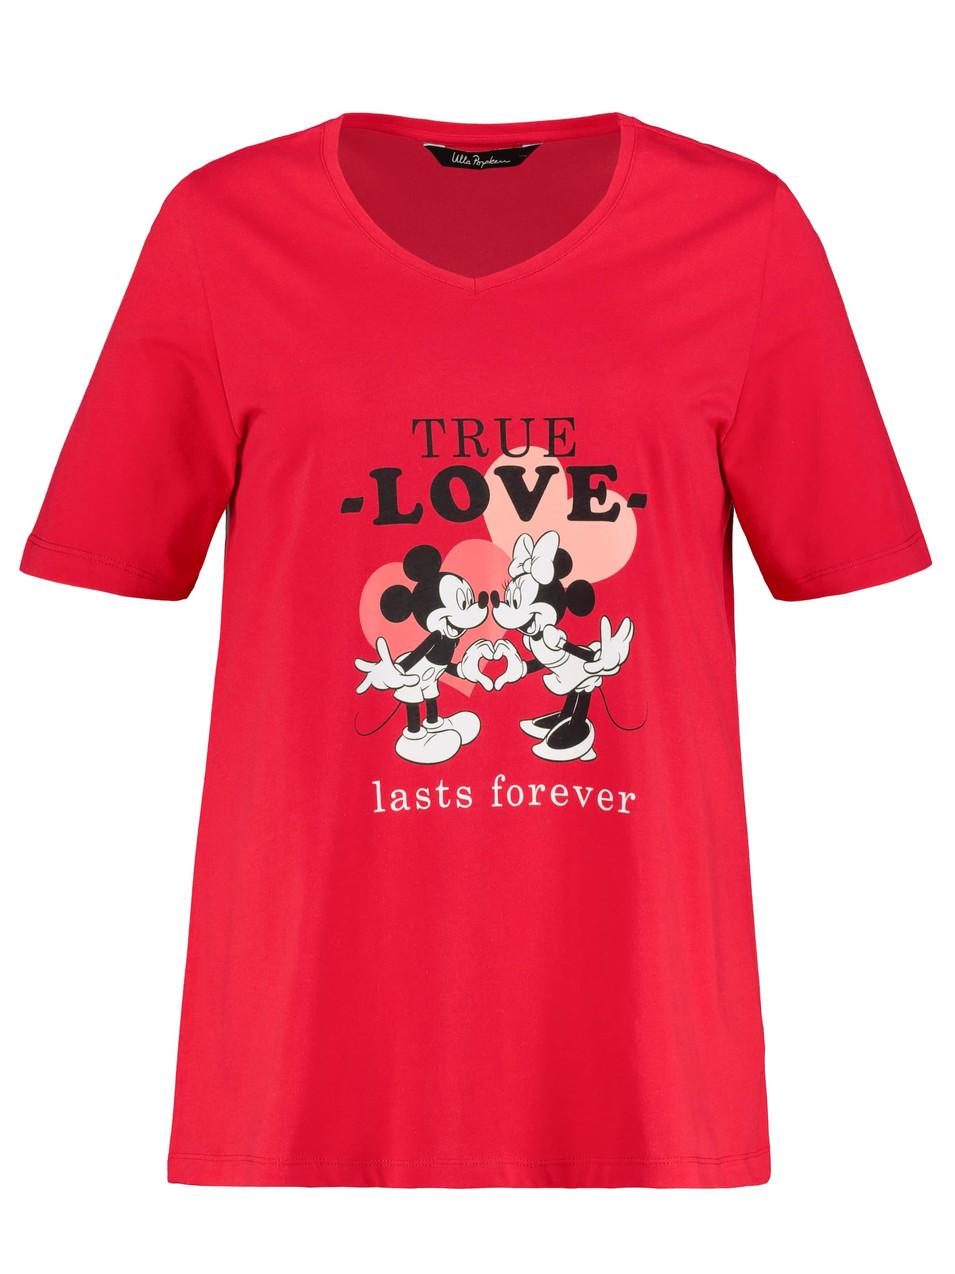 футболка 727 257 51-650